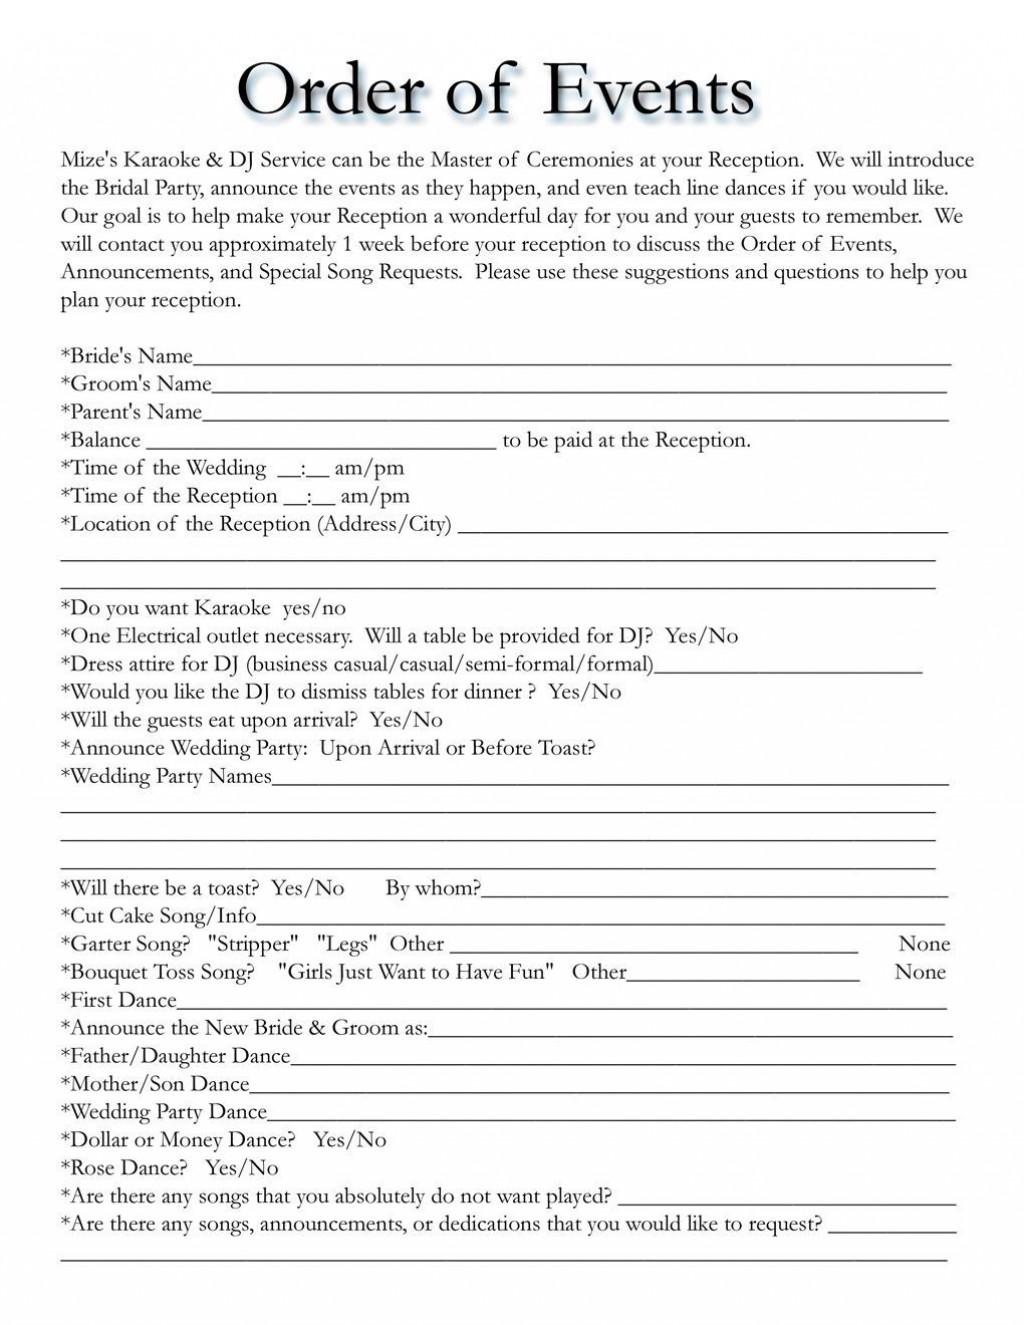 002 Formidable Wedding Timeline Template Free Sample  Day Excel ProgramLarge